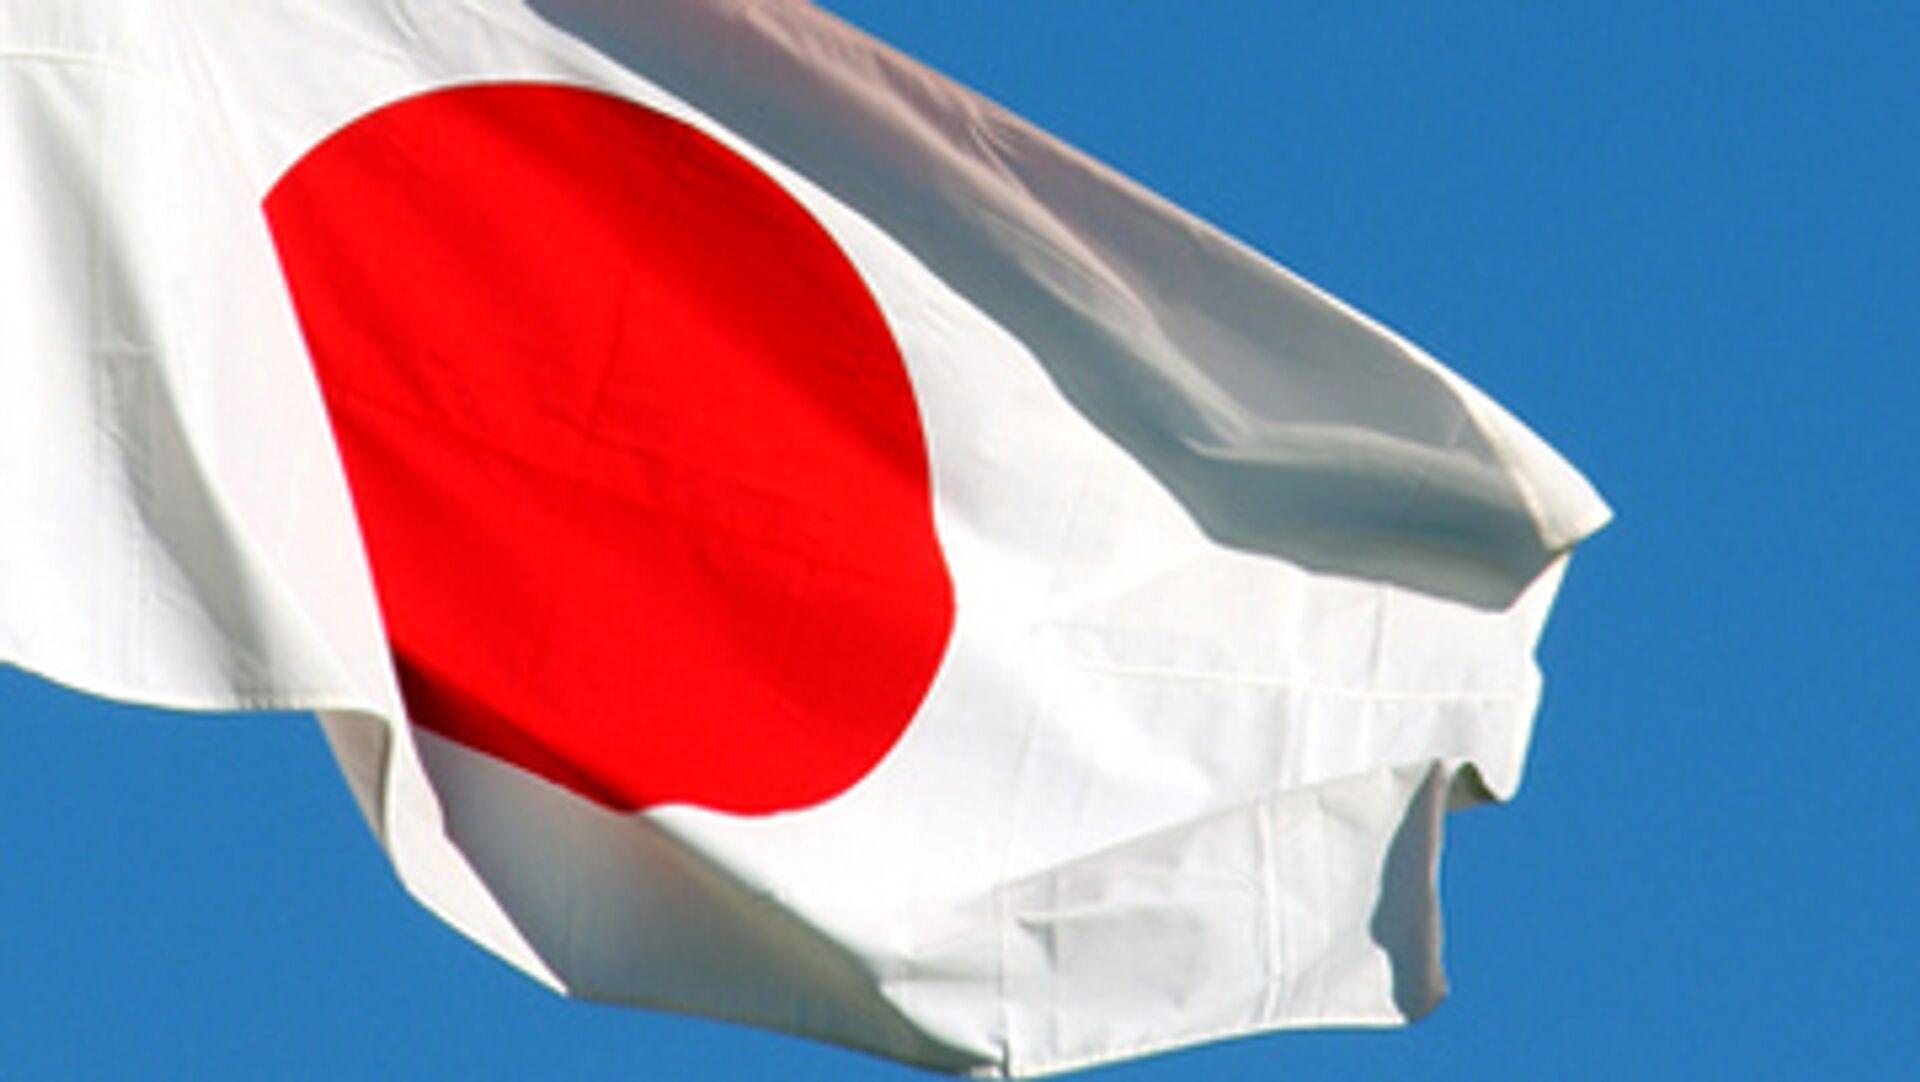 Флаг Японии - РИА Новости, 1920, 09.08.2021